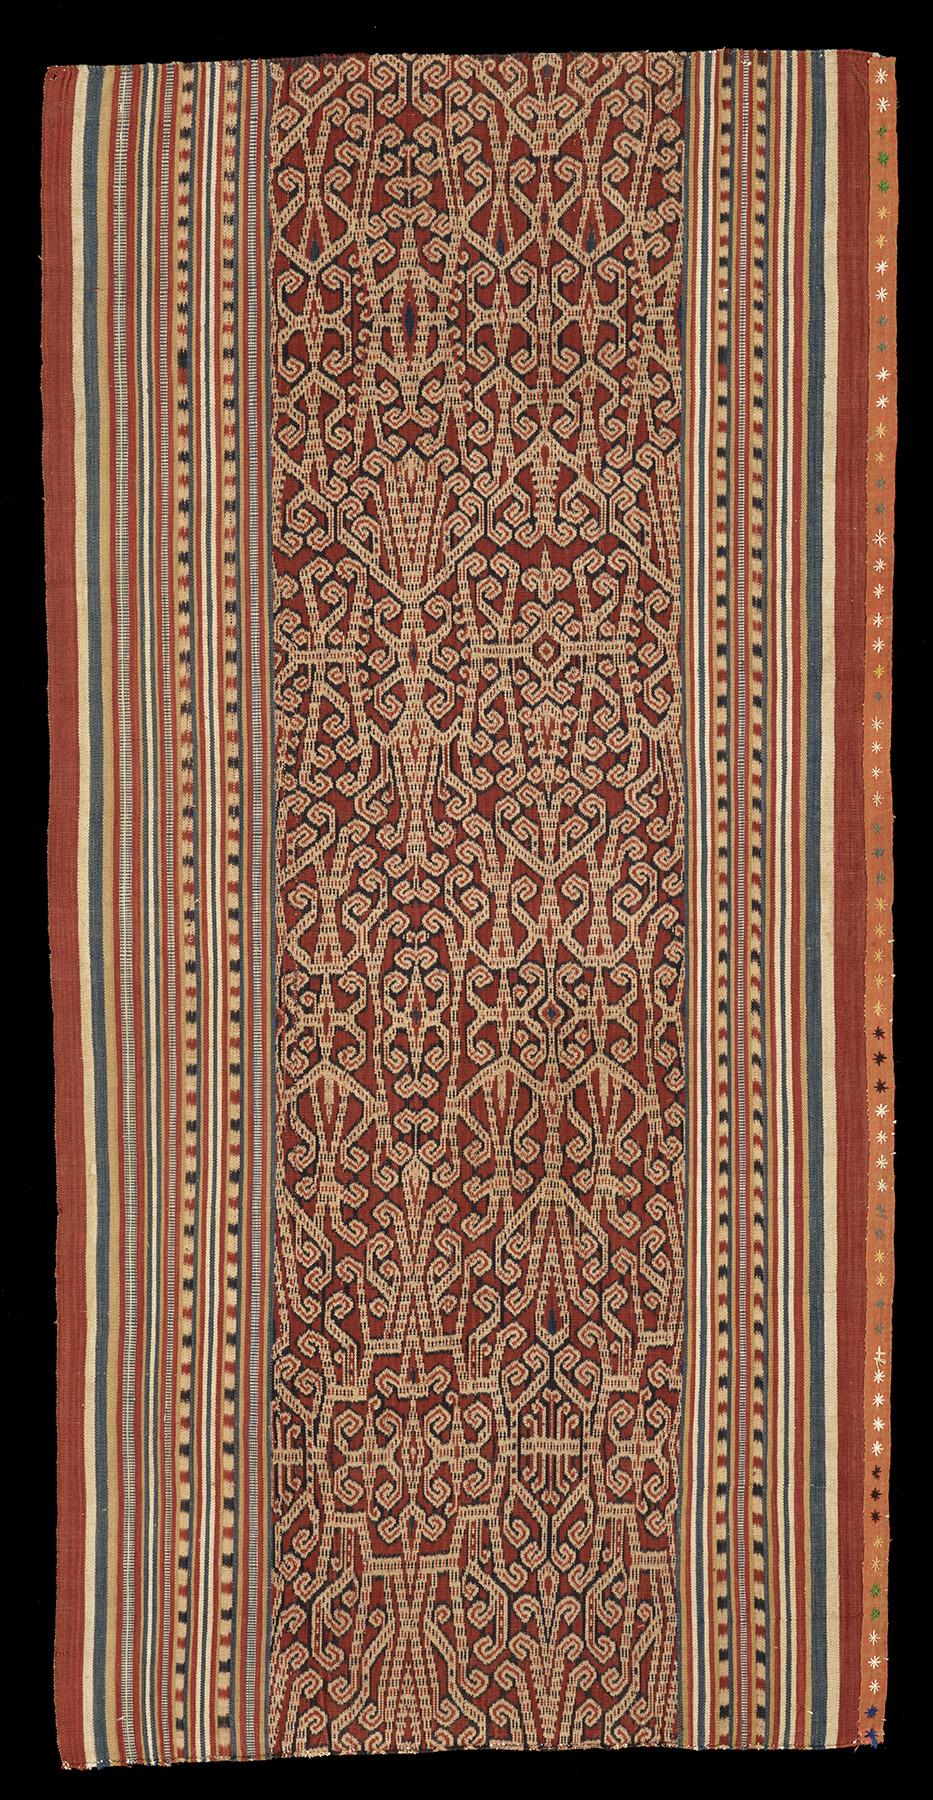 Kain Kebat © Dallas Museum of Art | Texas, USA